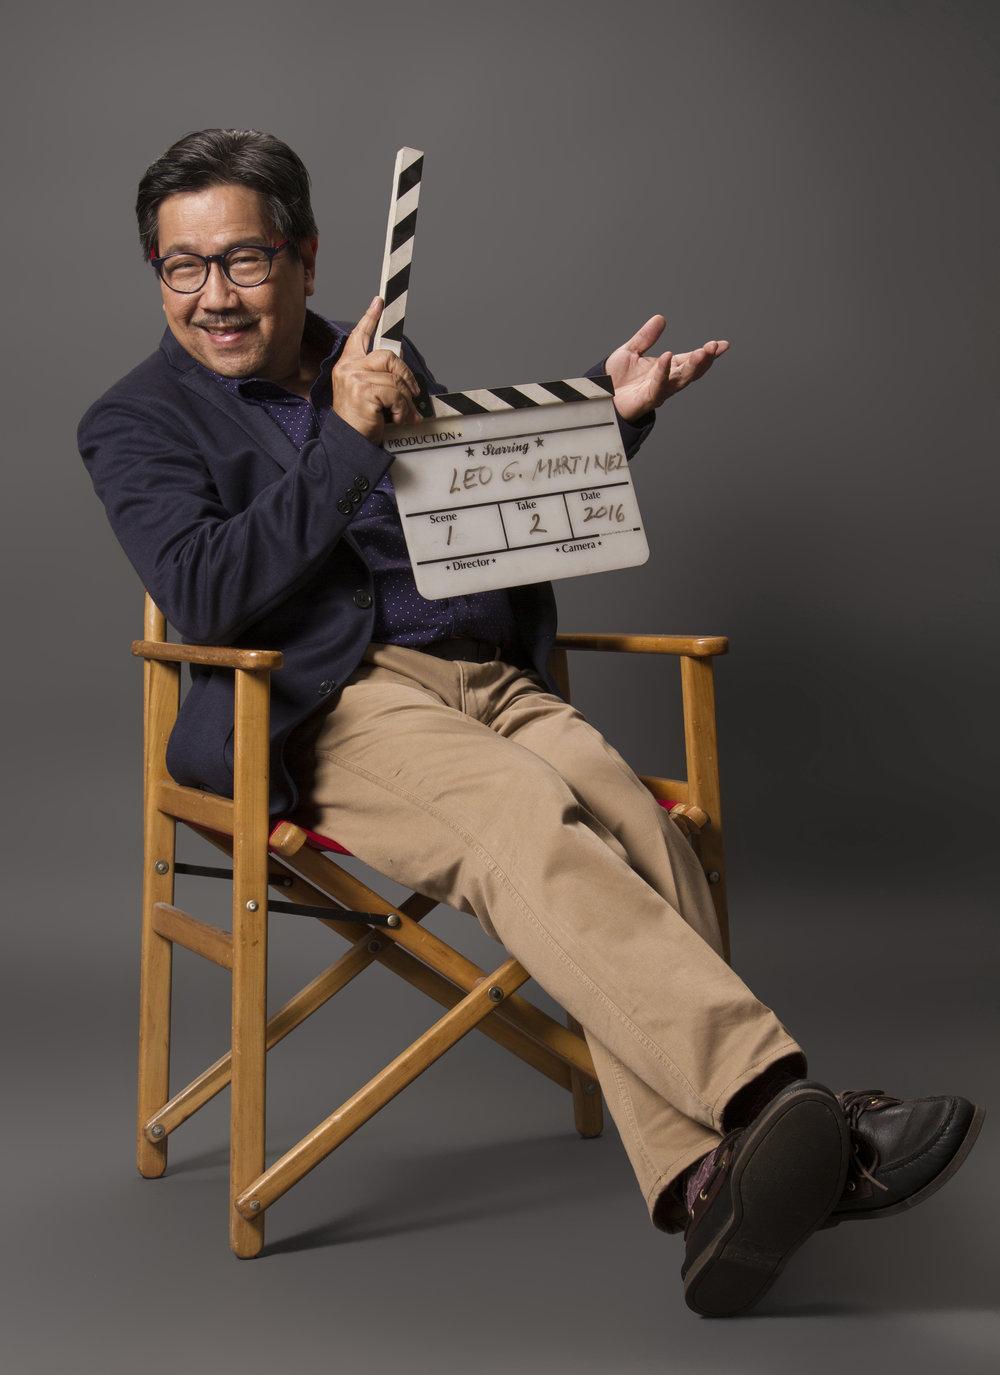 LEO MARTINEZ - Actor   Director